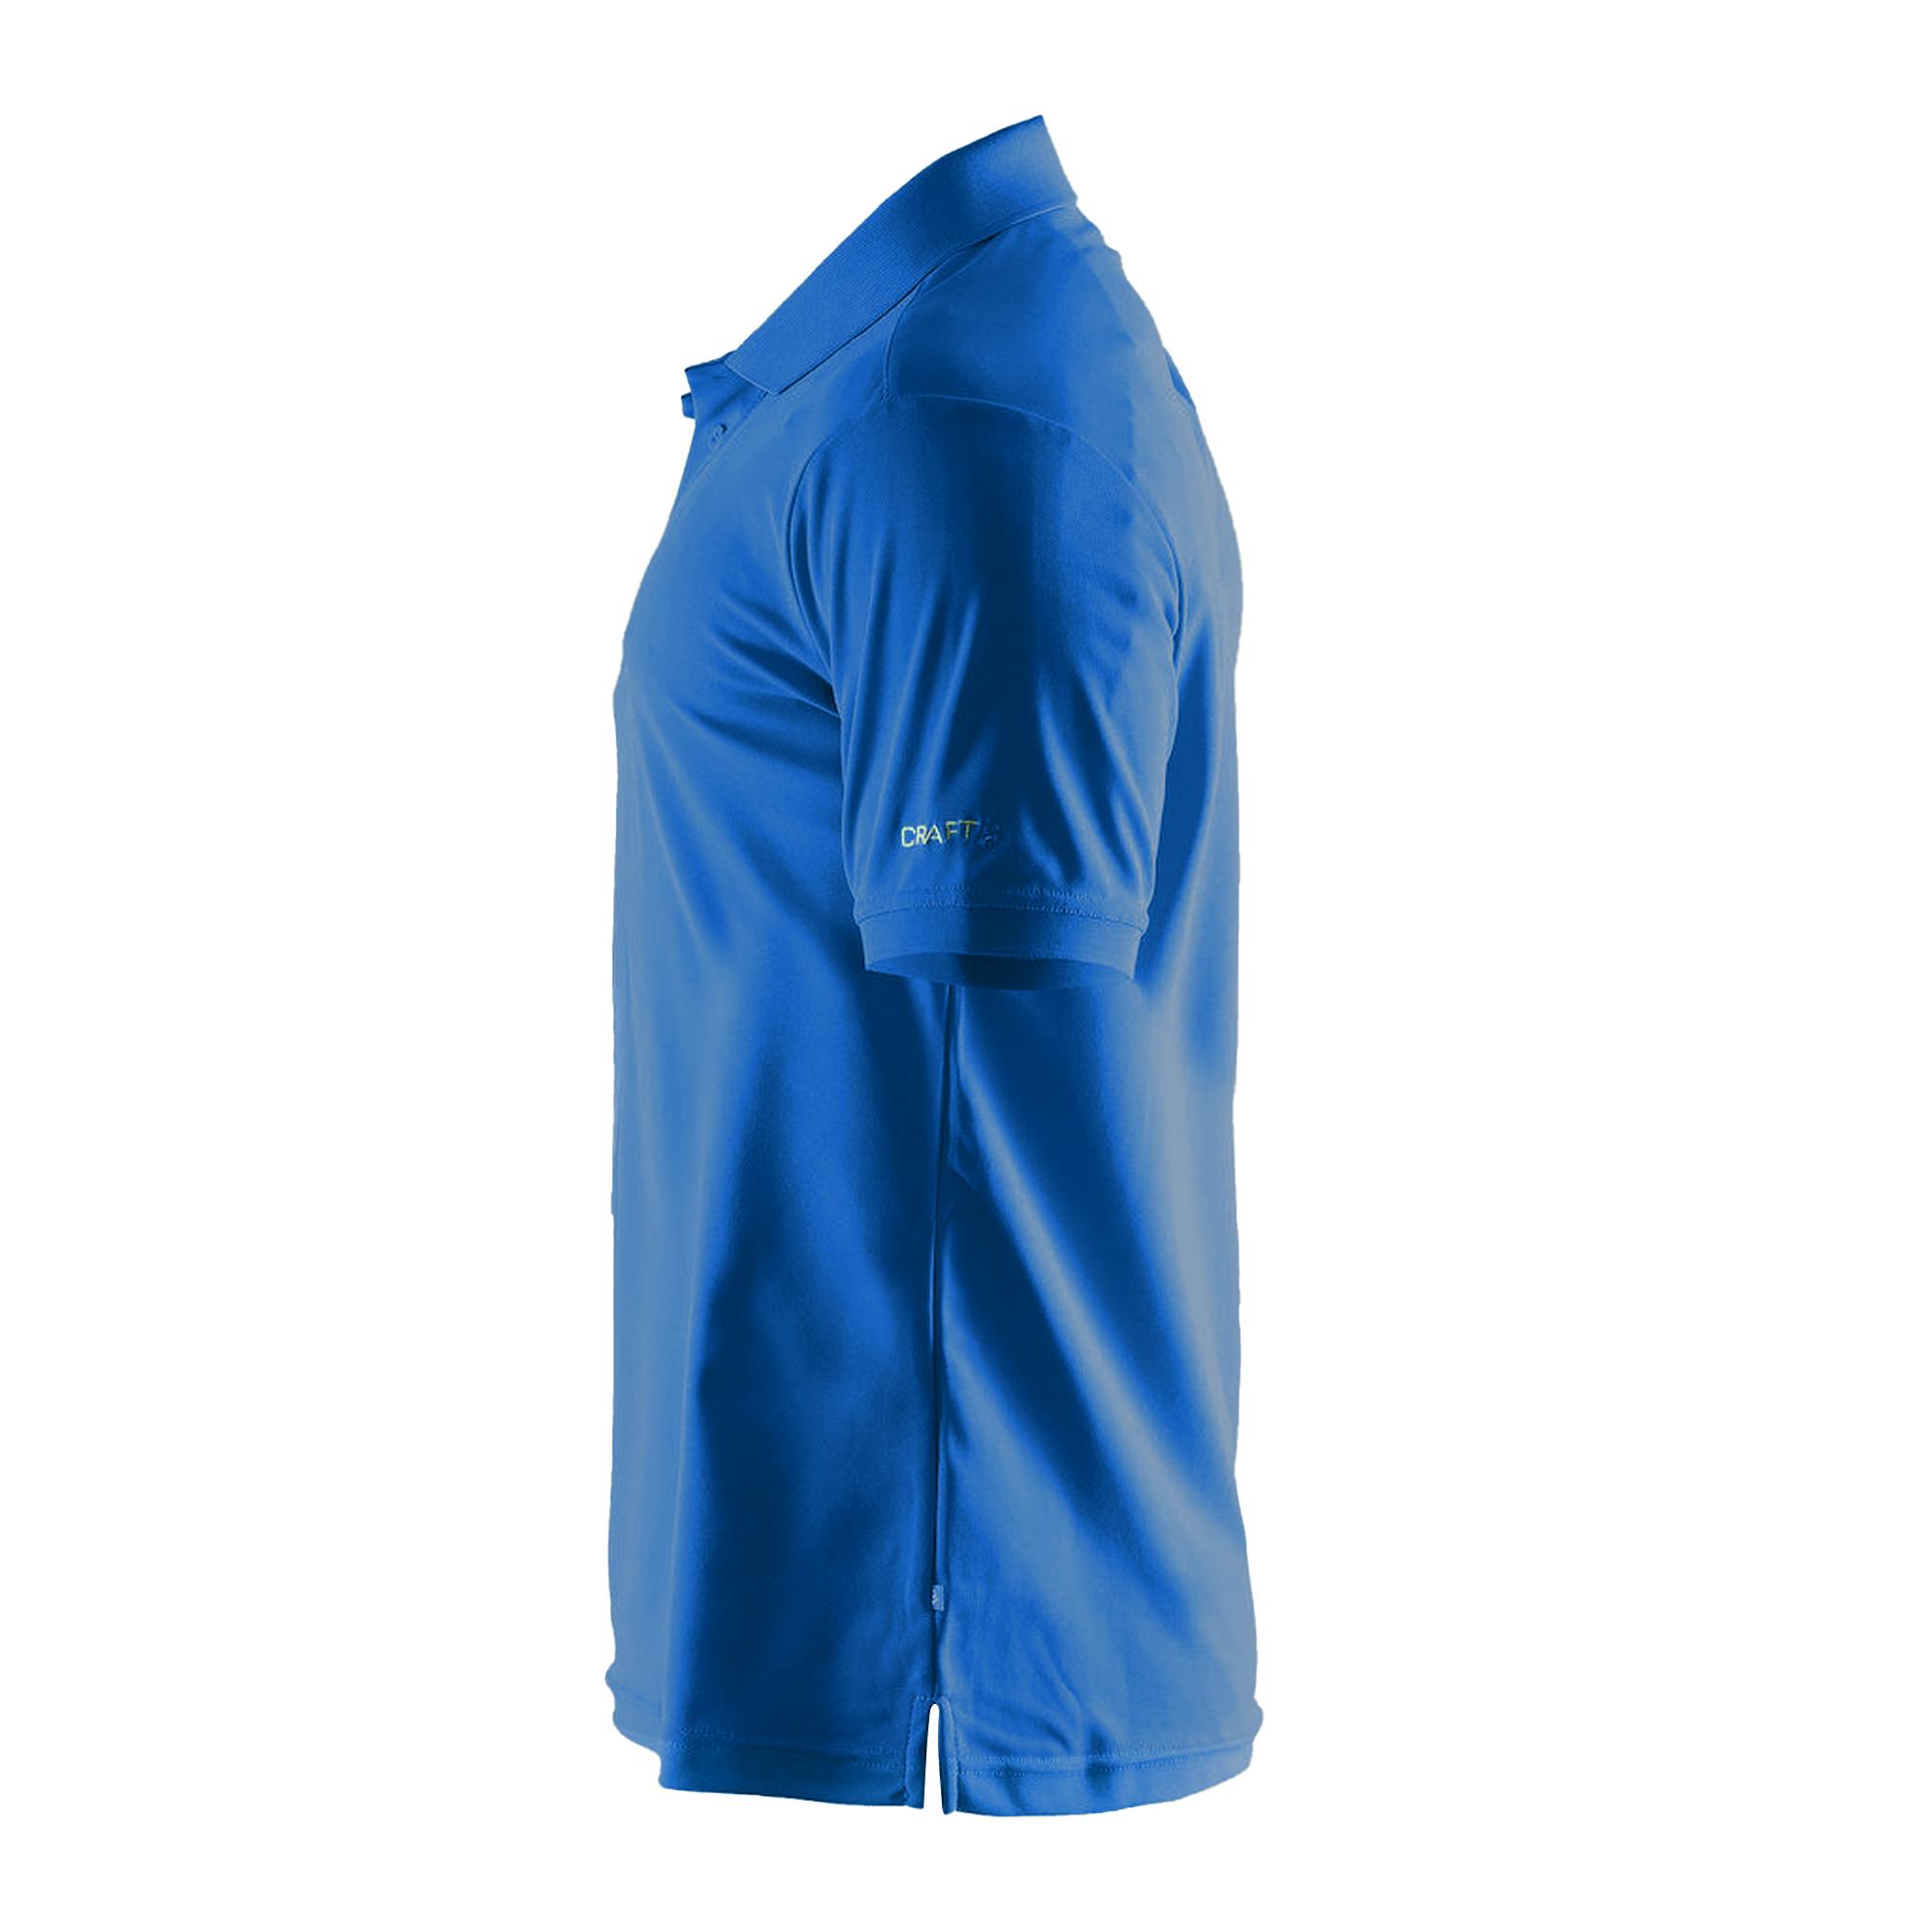 Craft Mens Classic Pique Short Sleeve Polo Shirt (2XL) (White)